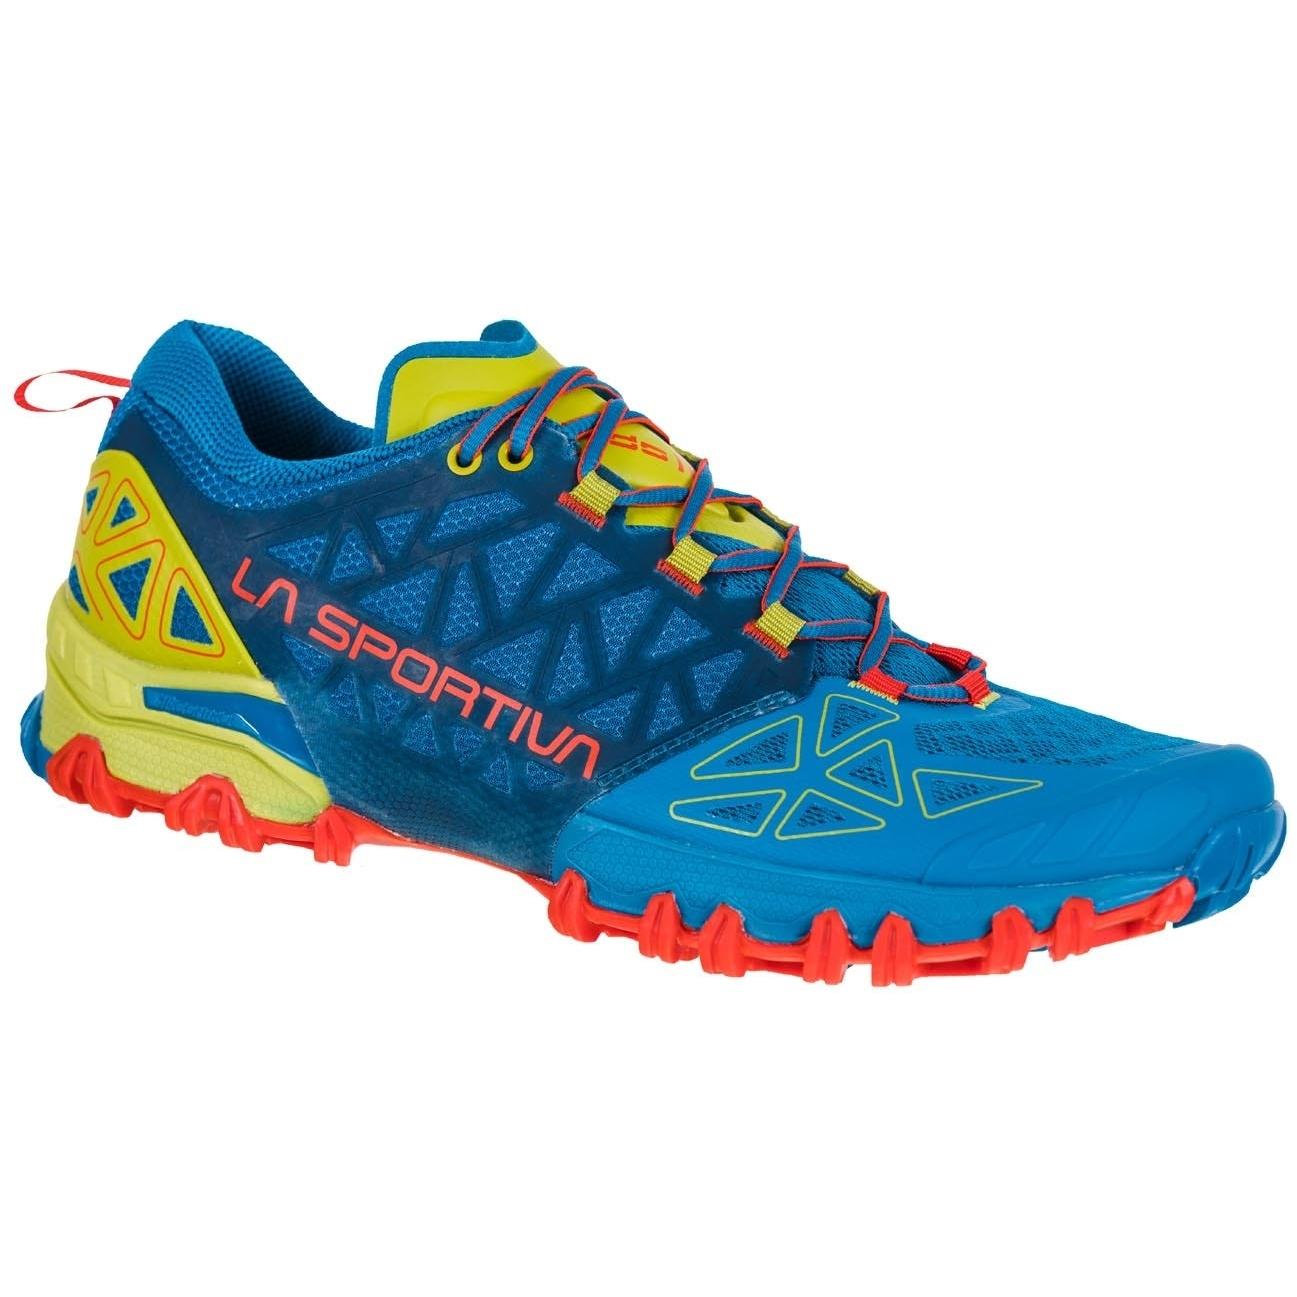 La Sportiva Bushido II Running Shoes - Neptune/Kiwi